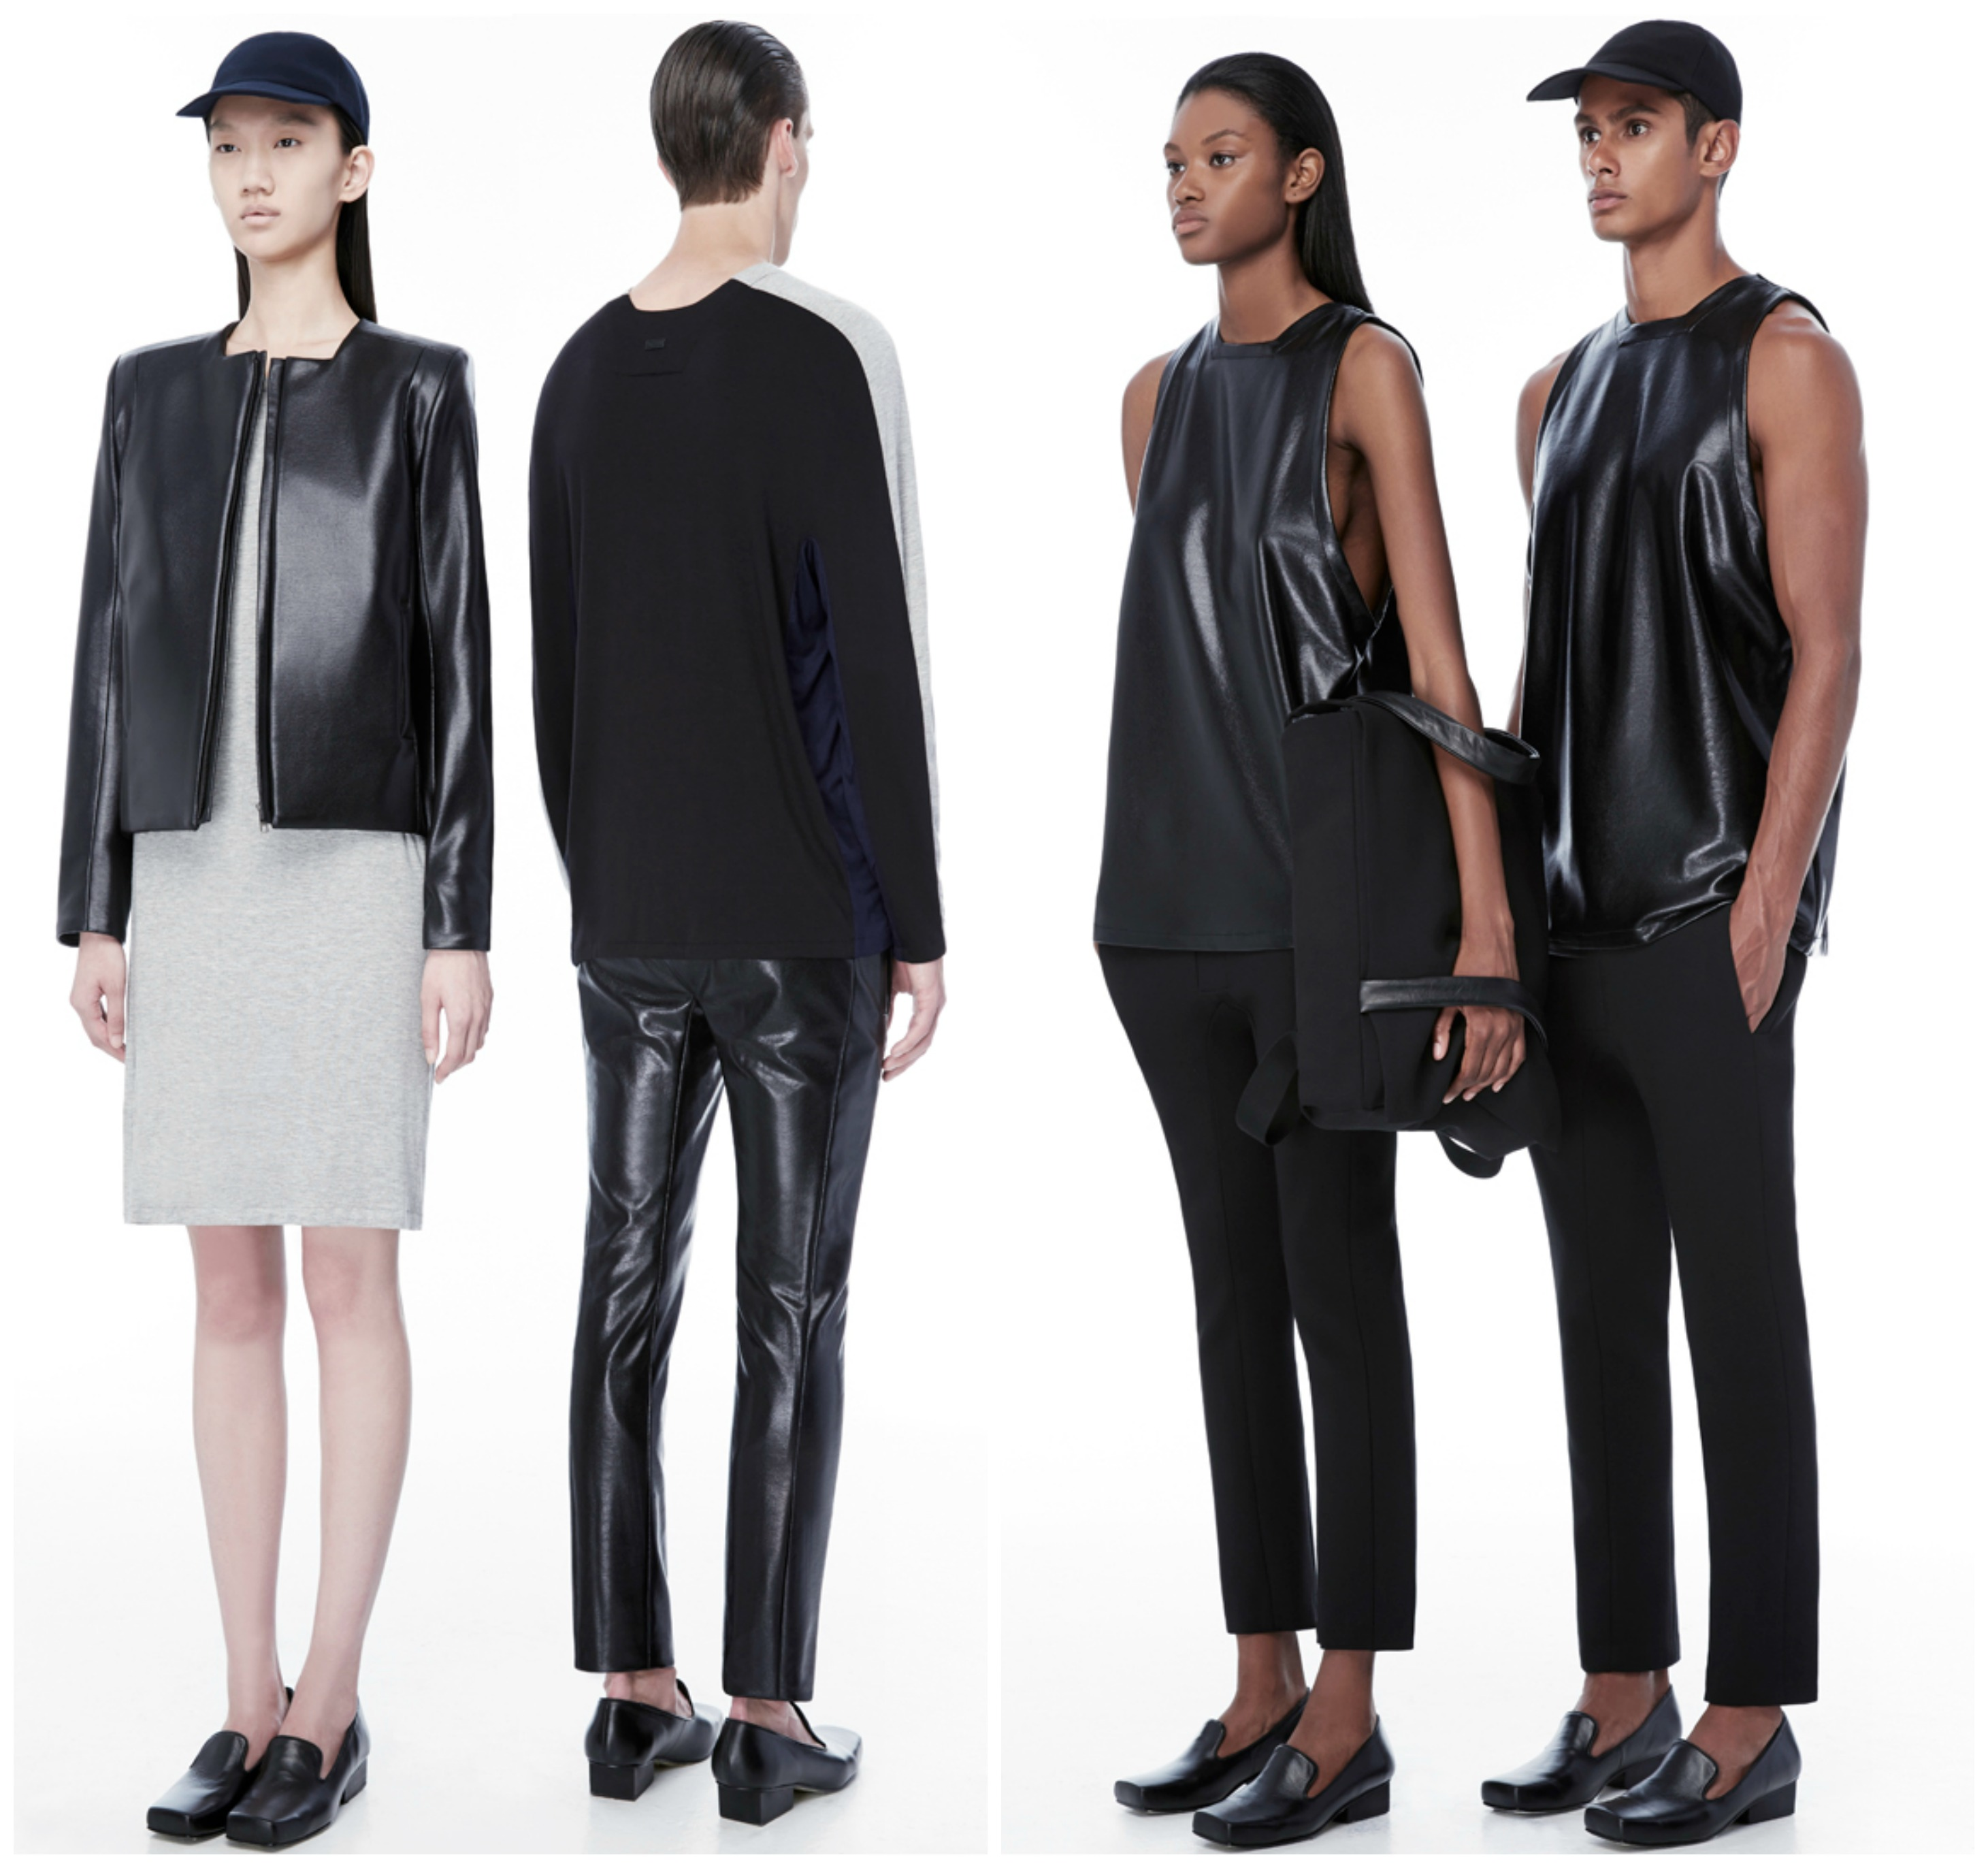 Fashion: The Fashion Talk